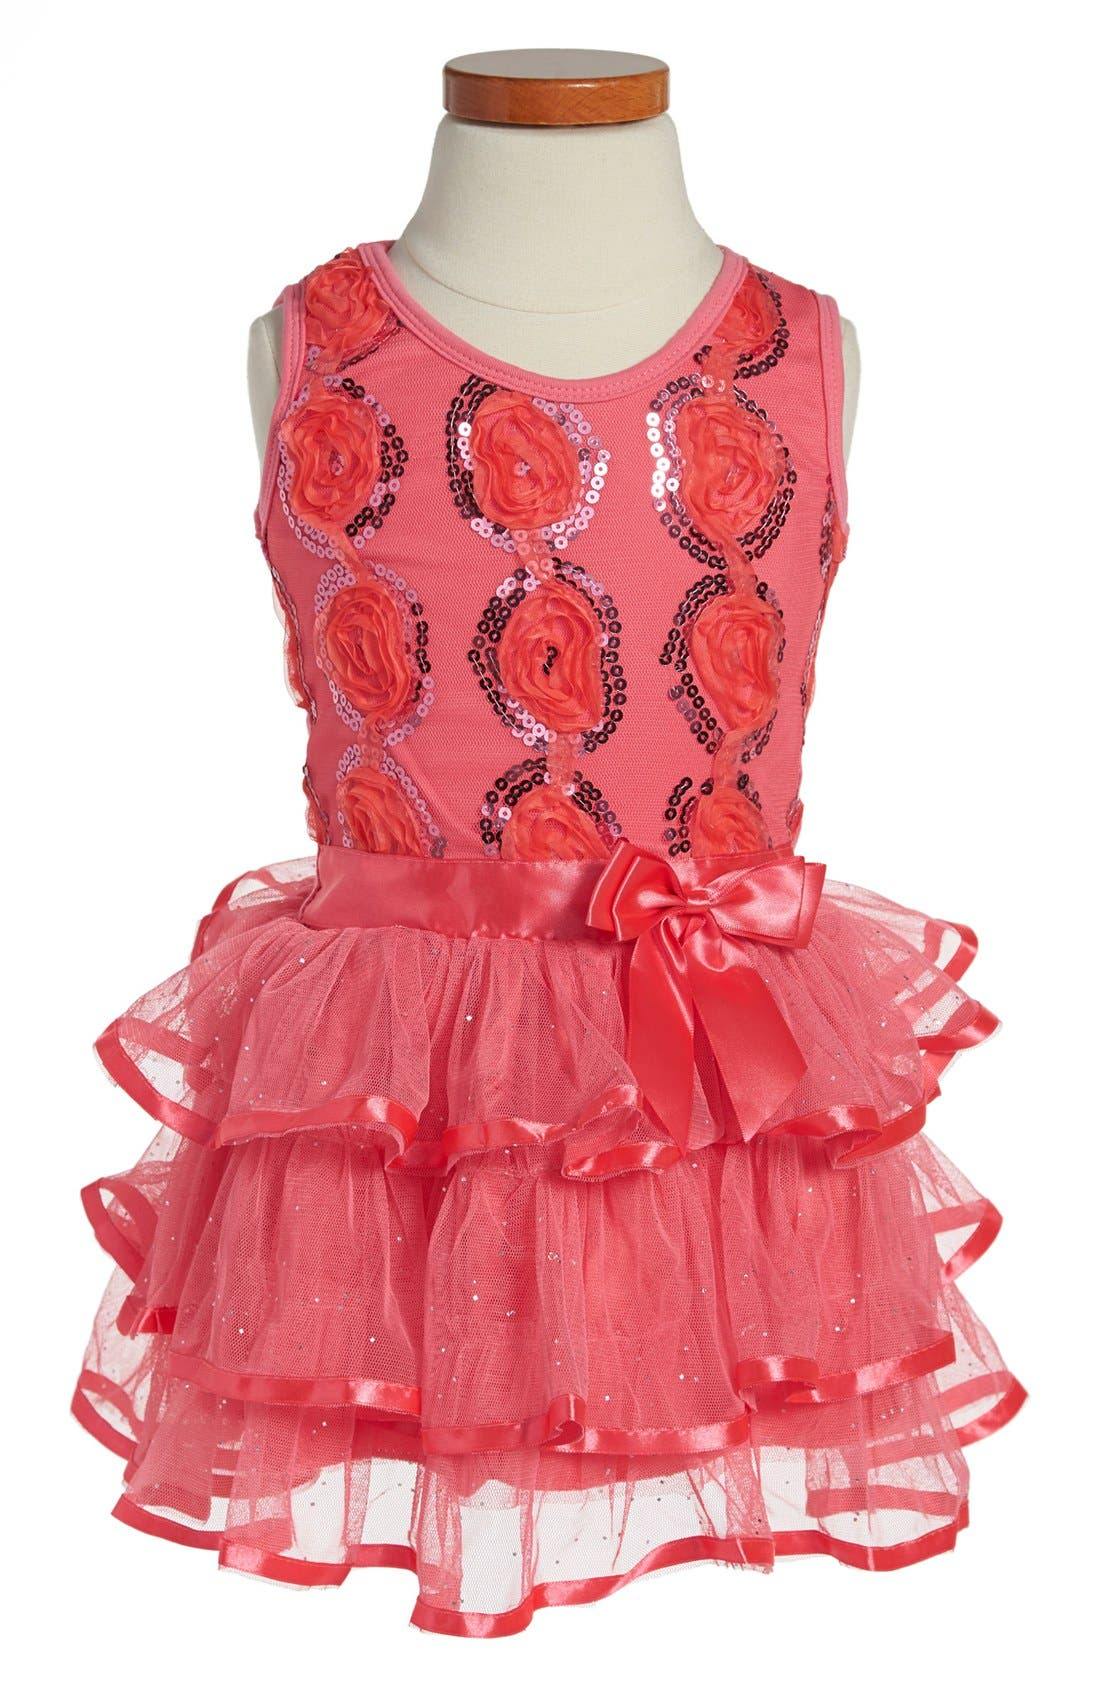 Main Image - Popatu Sequin Tiered Dress (Toddler Girls)